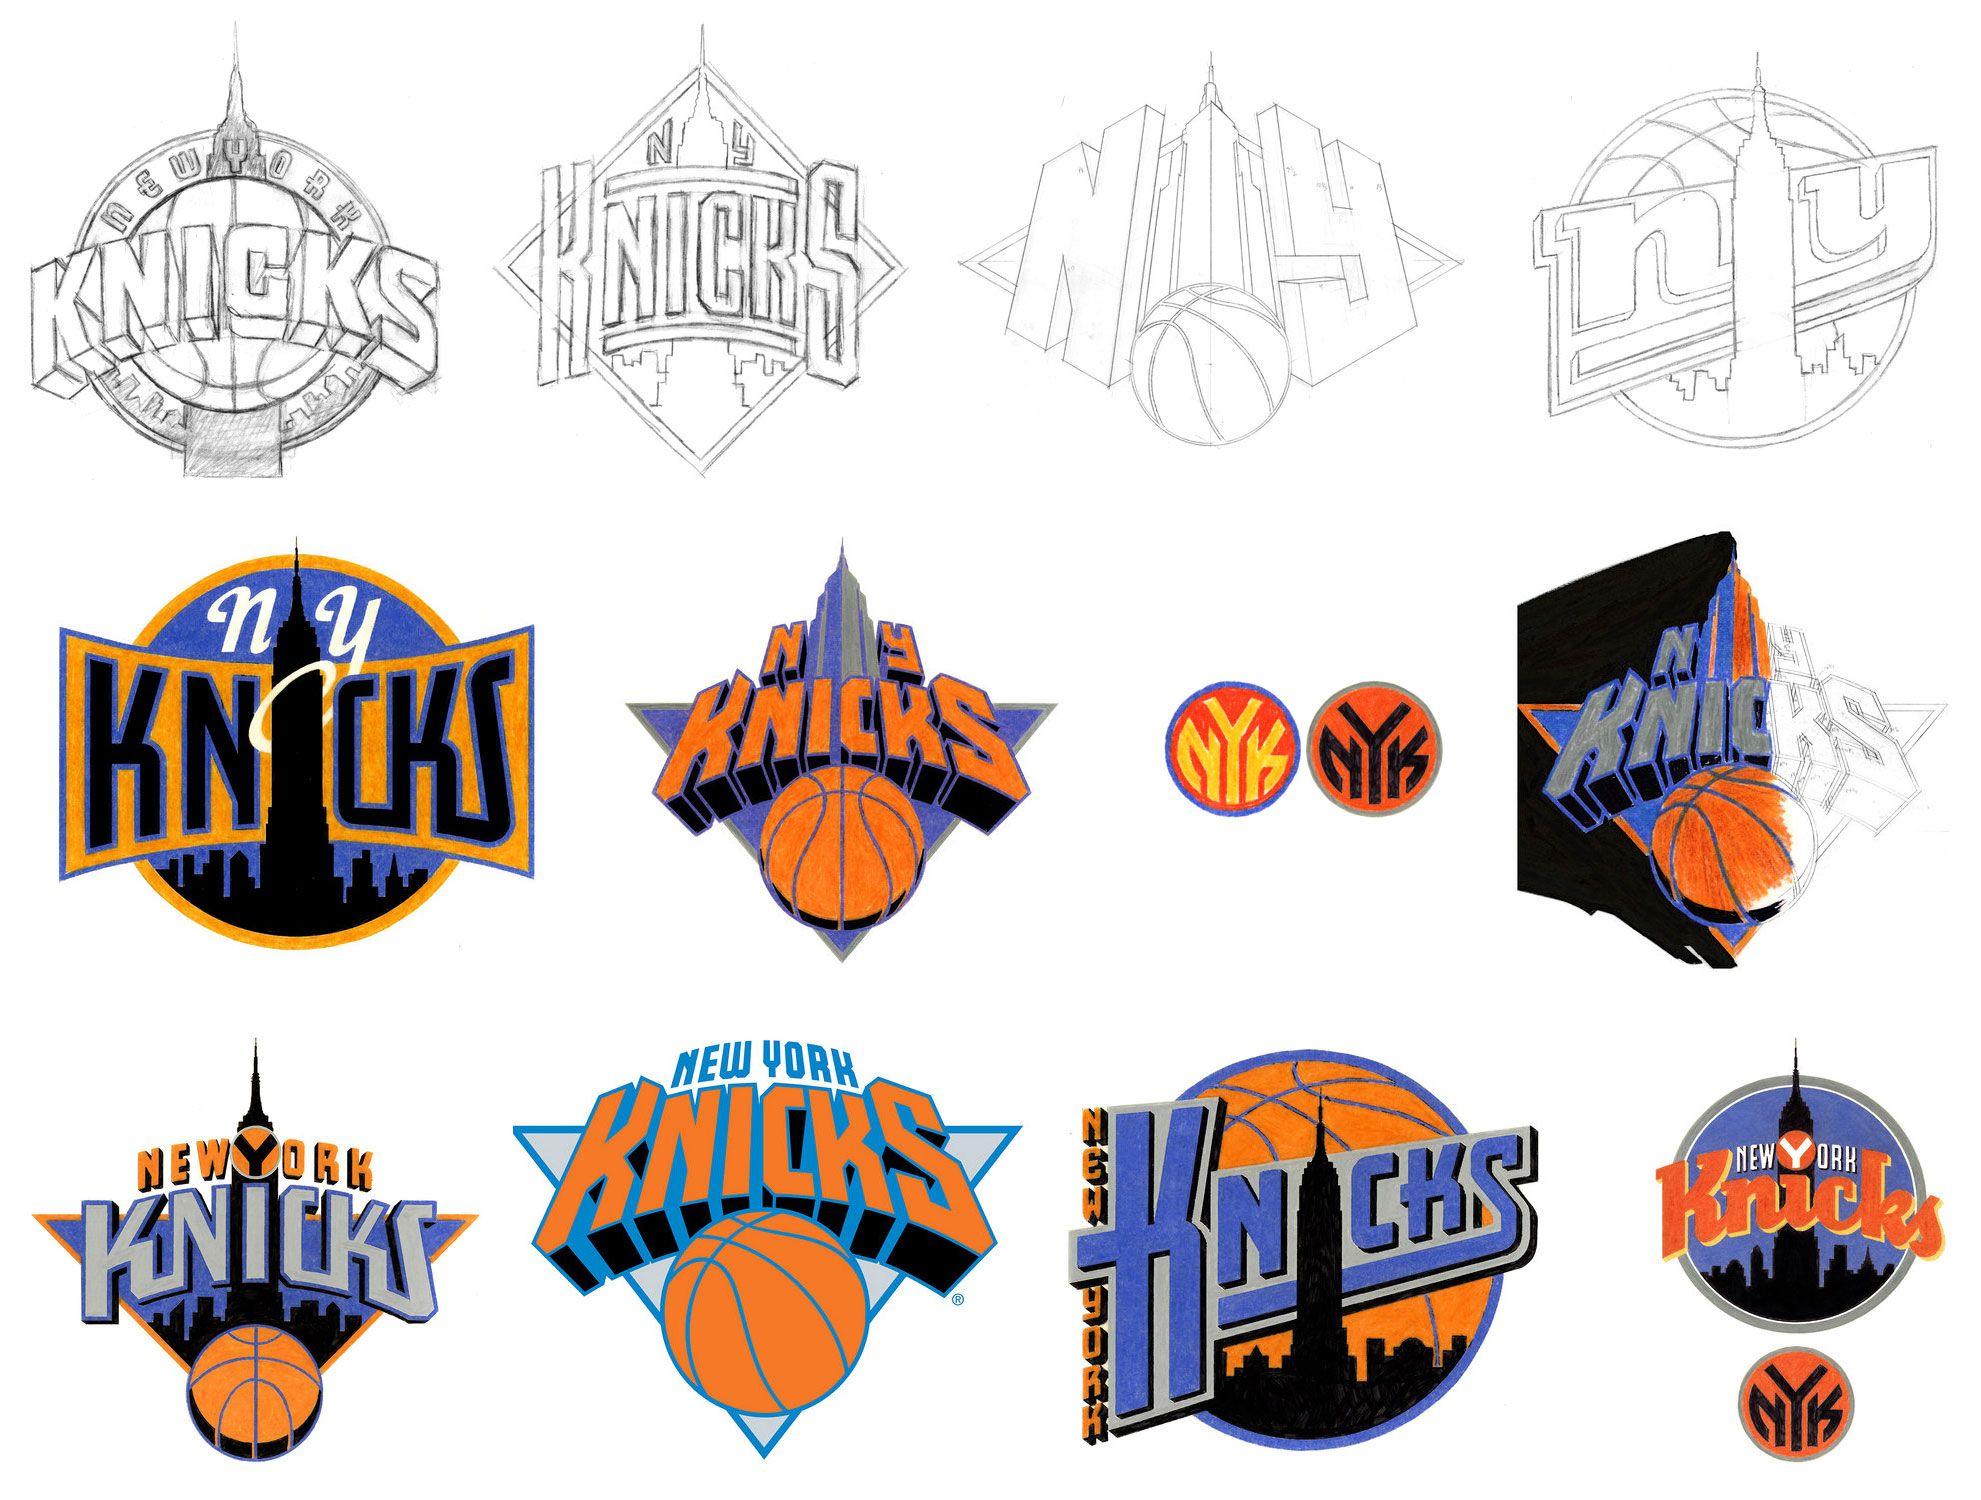 New York Knicks HD Wallpapers New York Knicks